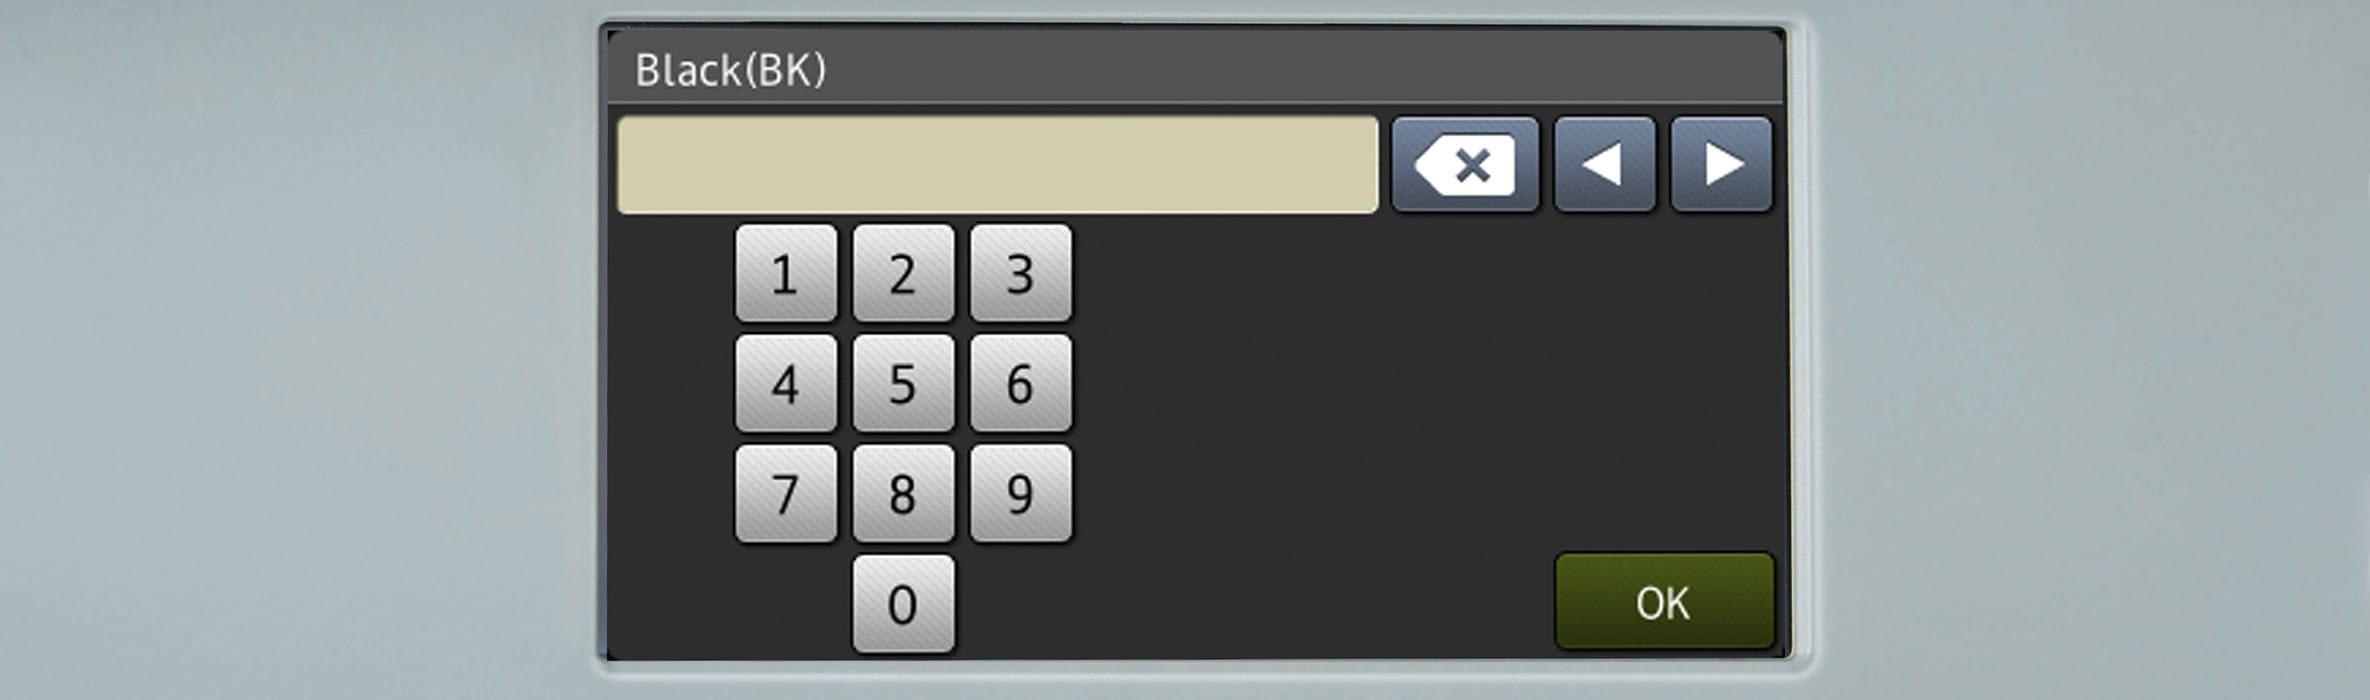 Ecran tactil pe imprimanta Brother cu tastatura numerica